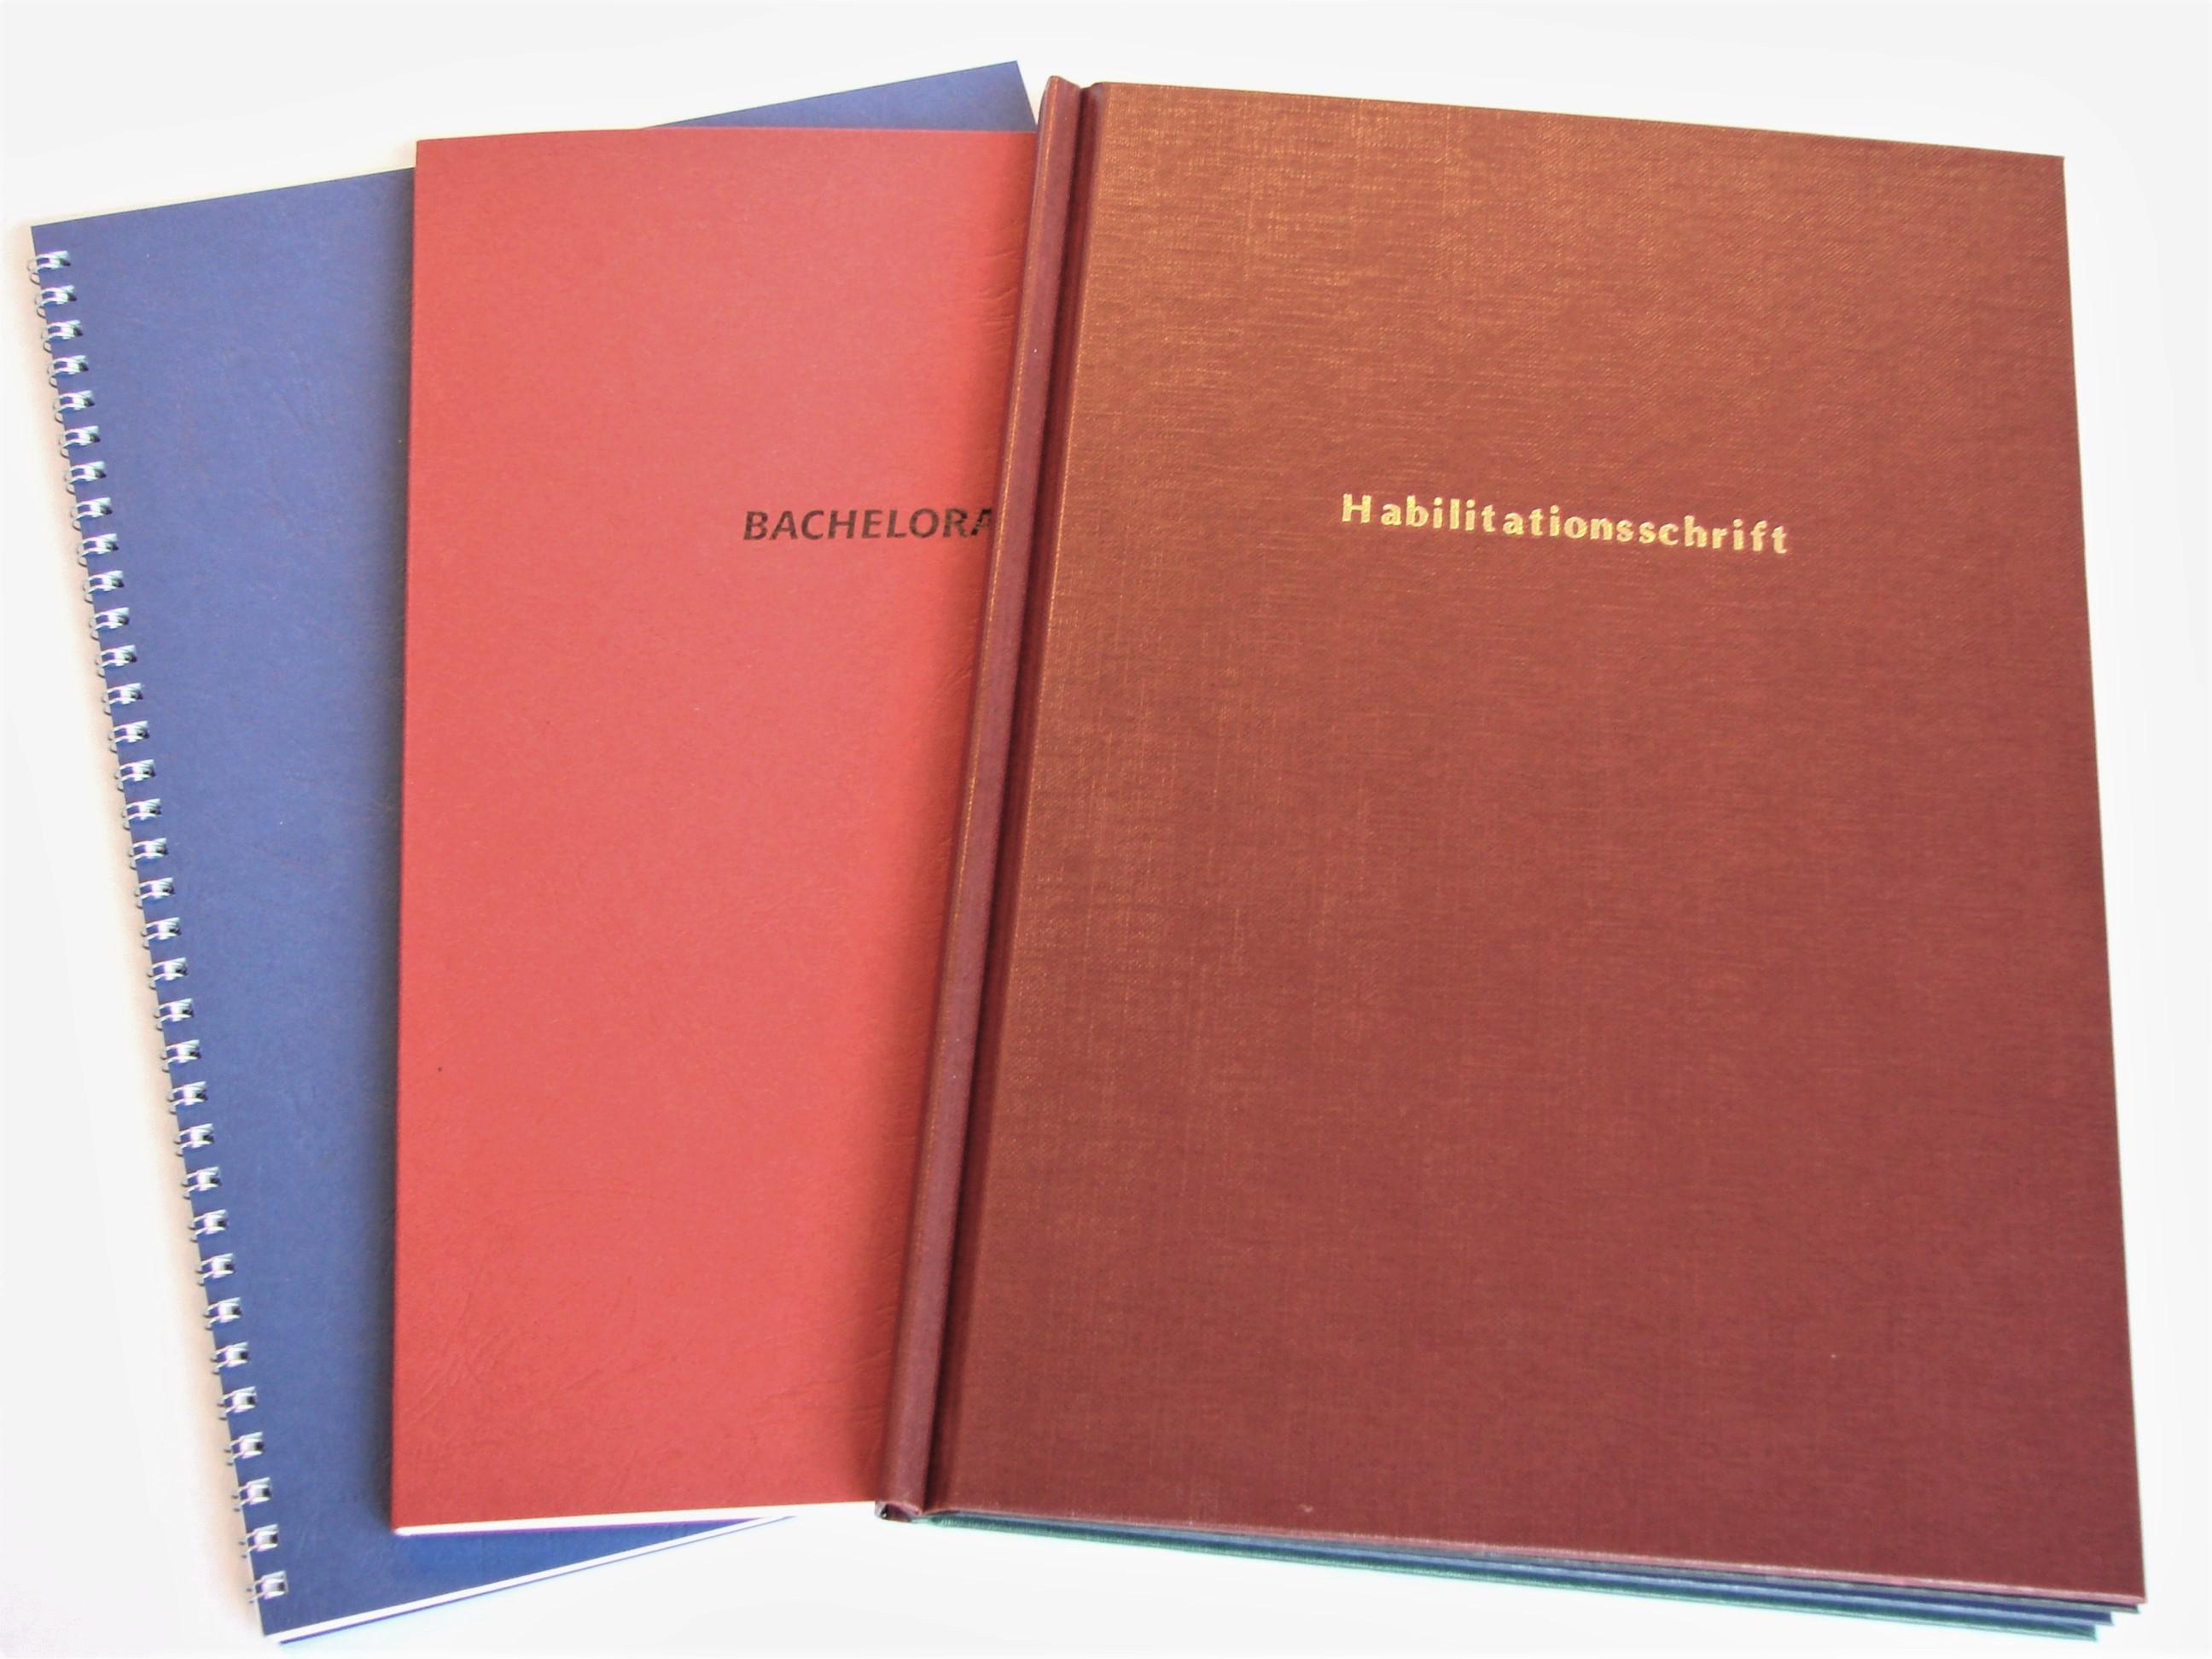 Spiral-, Softcover-, Hardcover-Bindungen